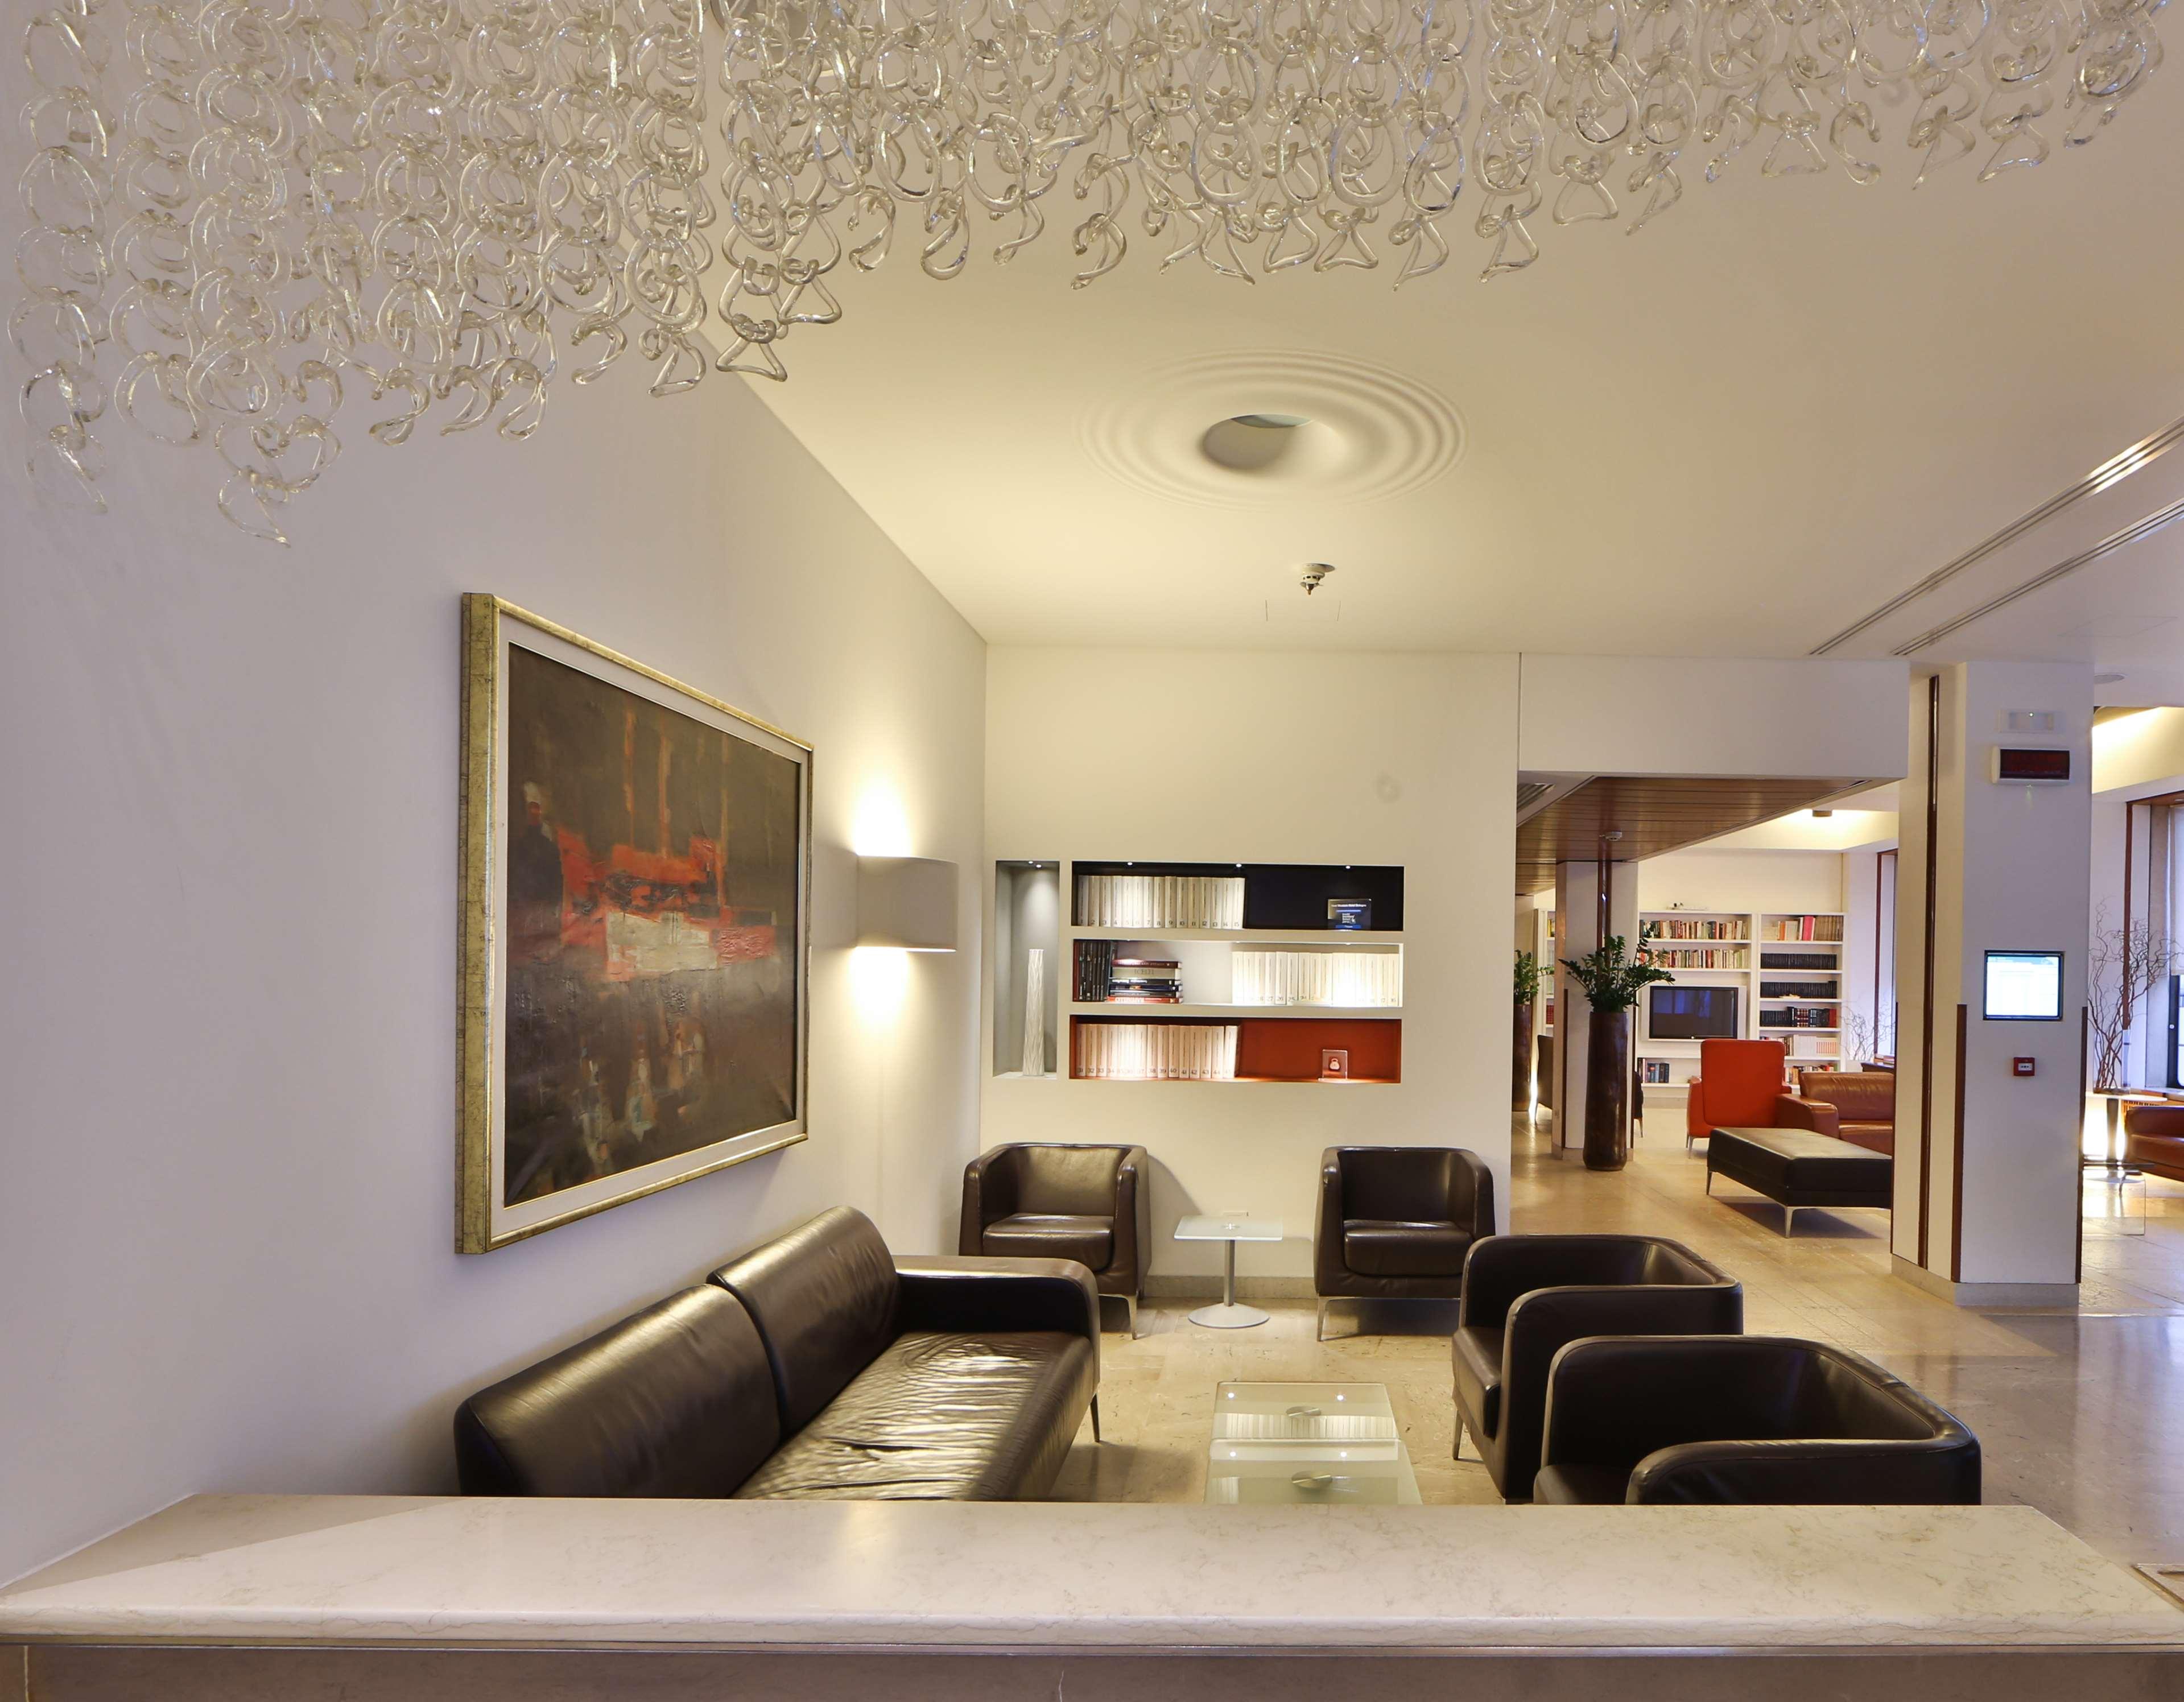 Best western plus hotel bologna alberghi alberghi for Hotel design bologna